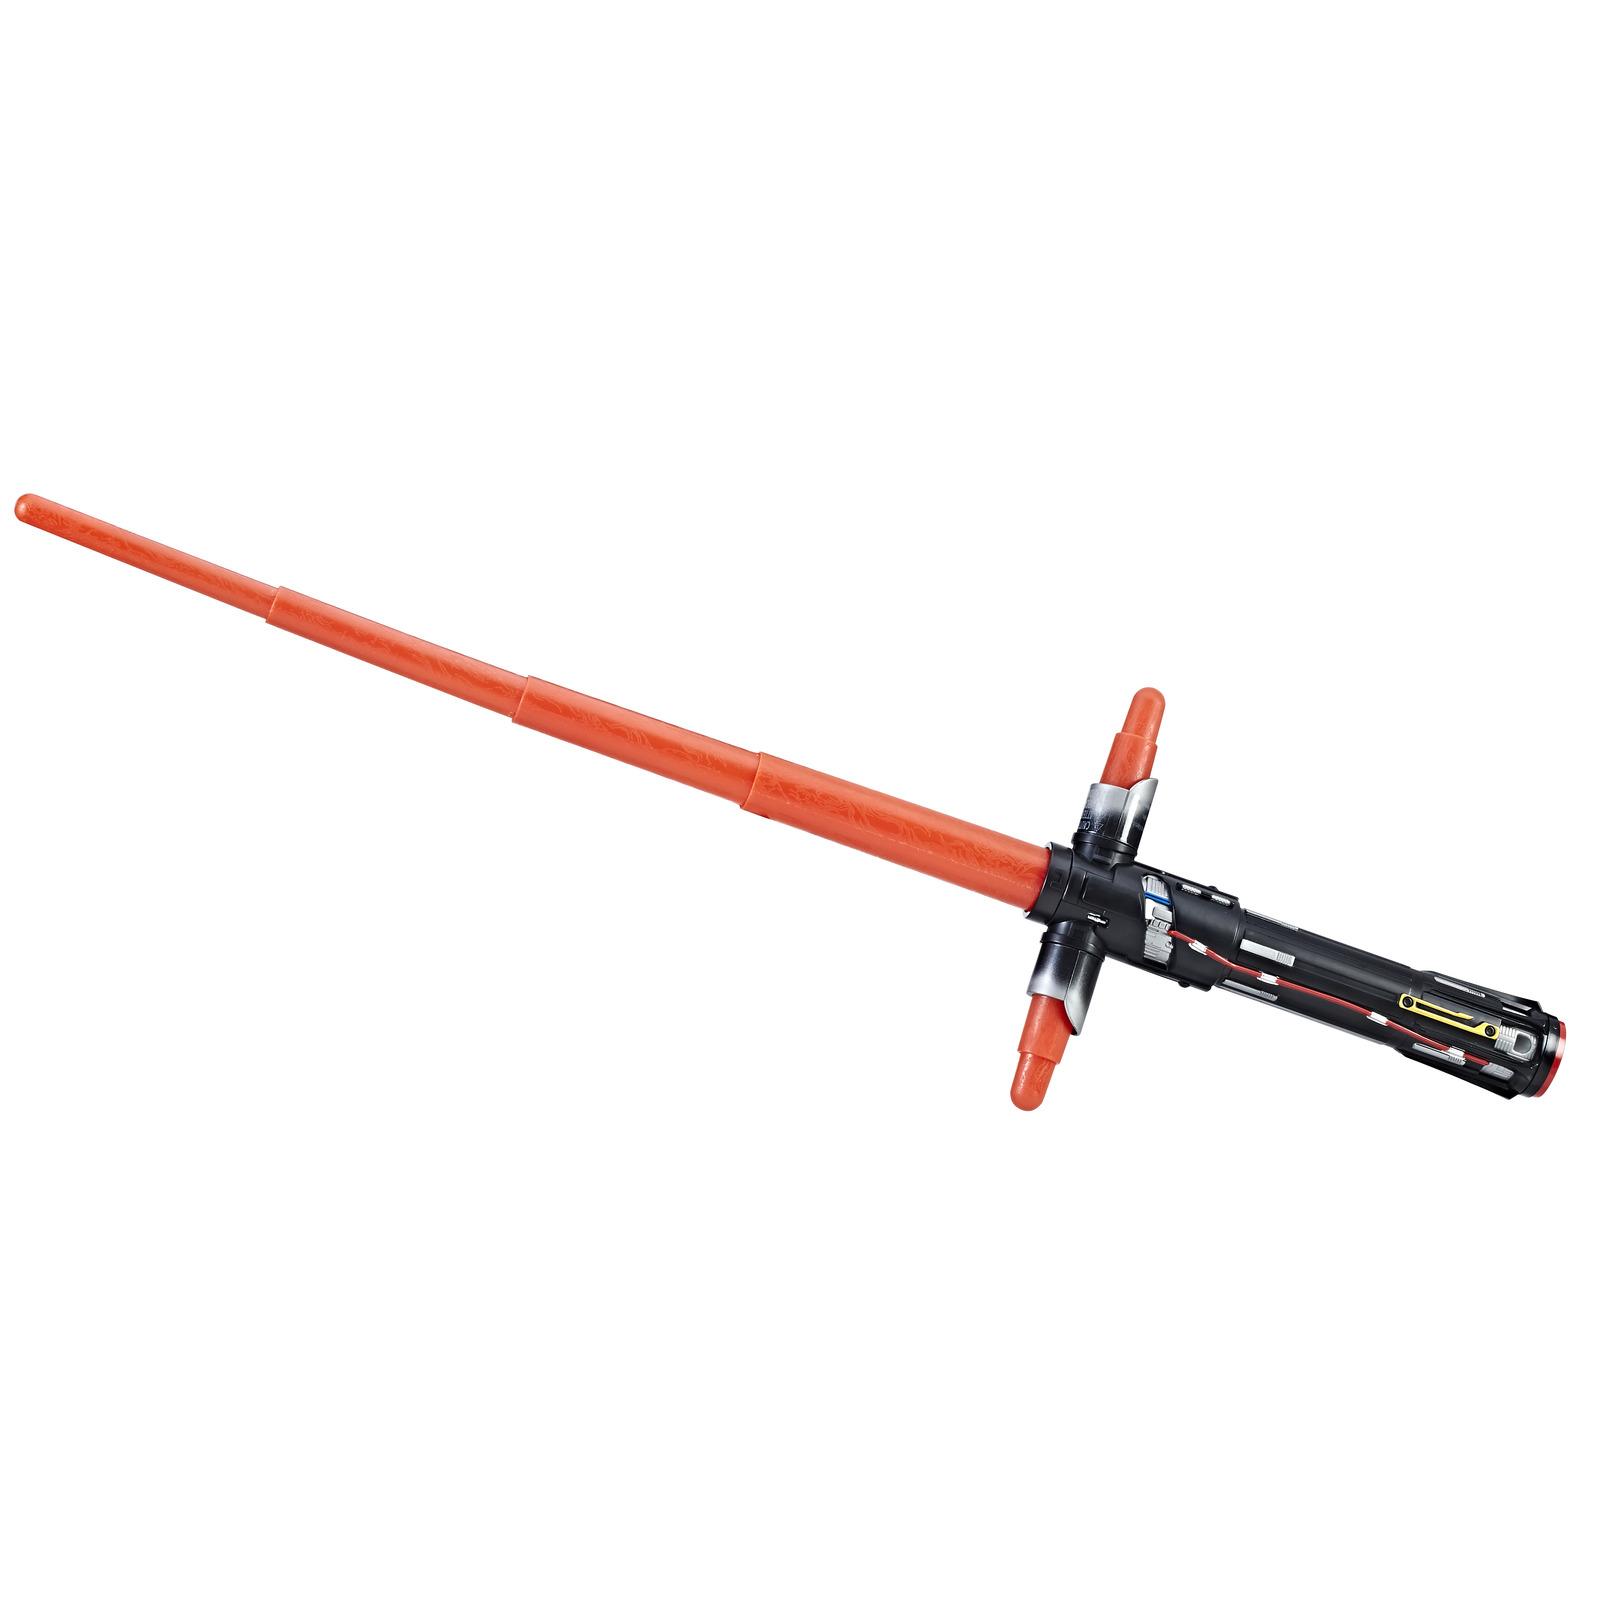 Star Wars: Extendable Lightsaber - Kylo Ren image